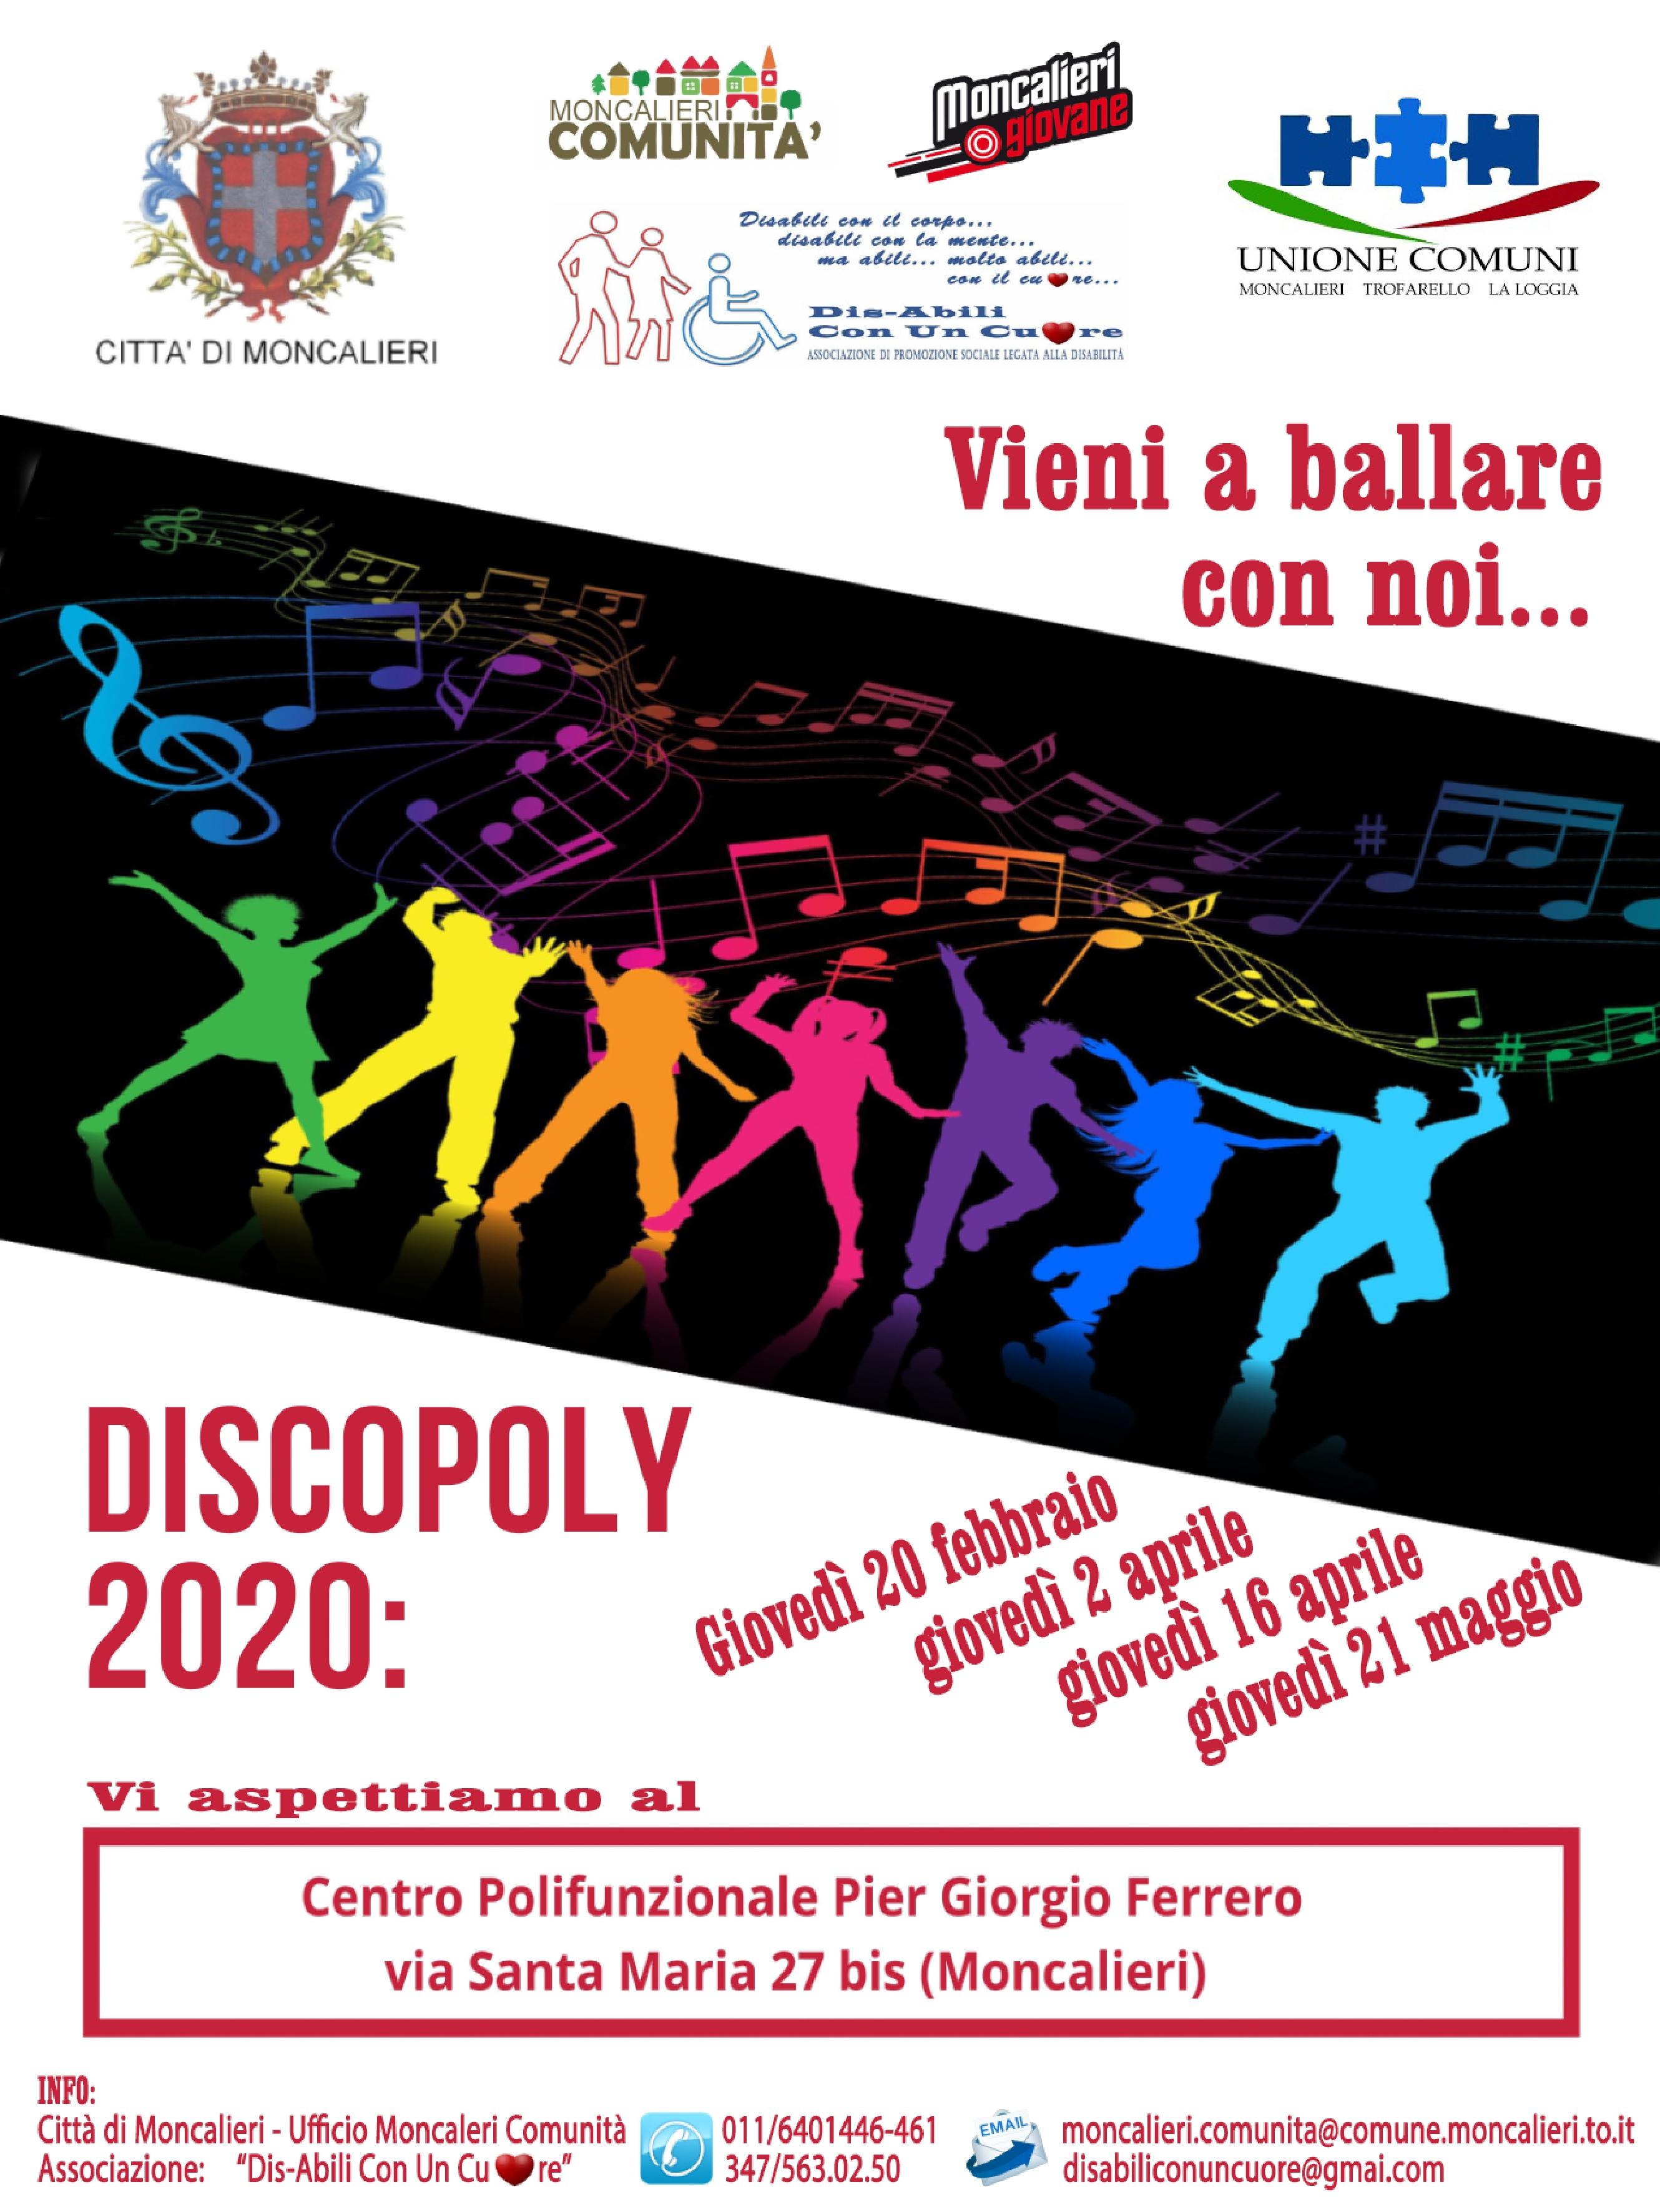 DISCOPOLI 2020